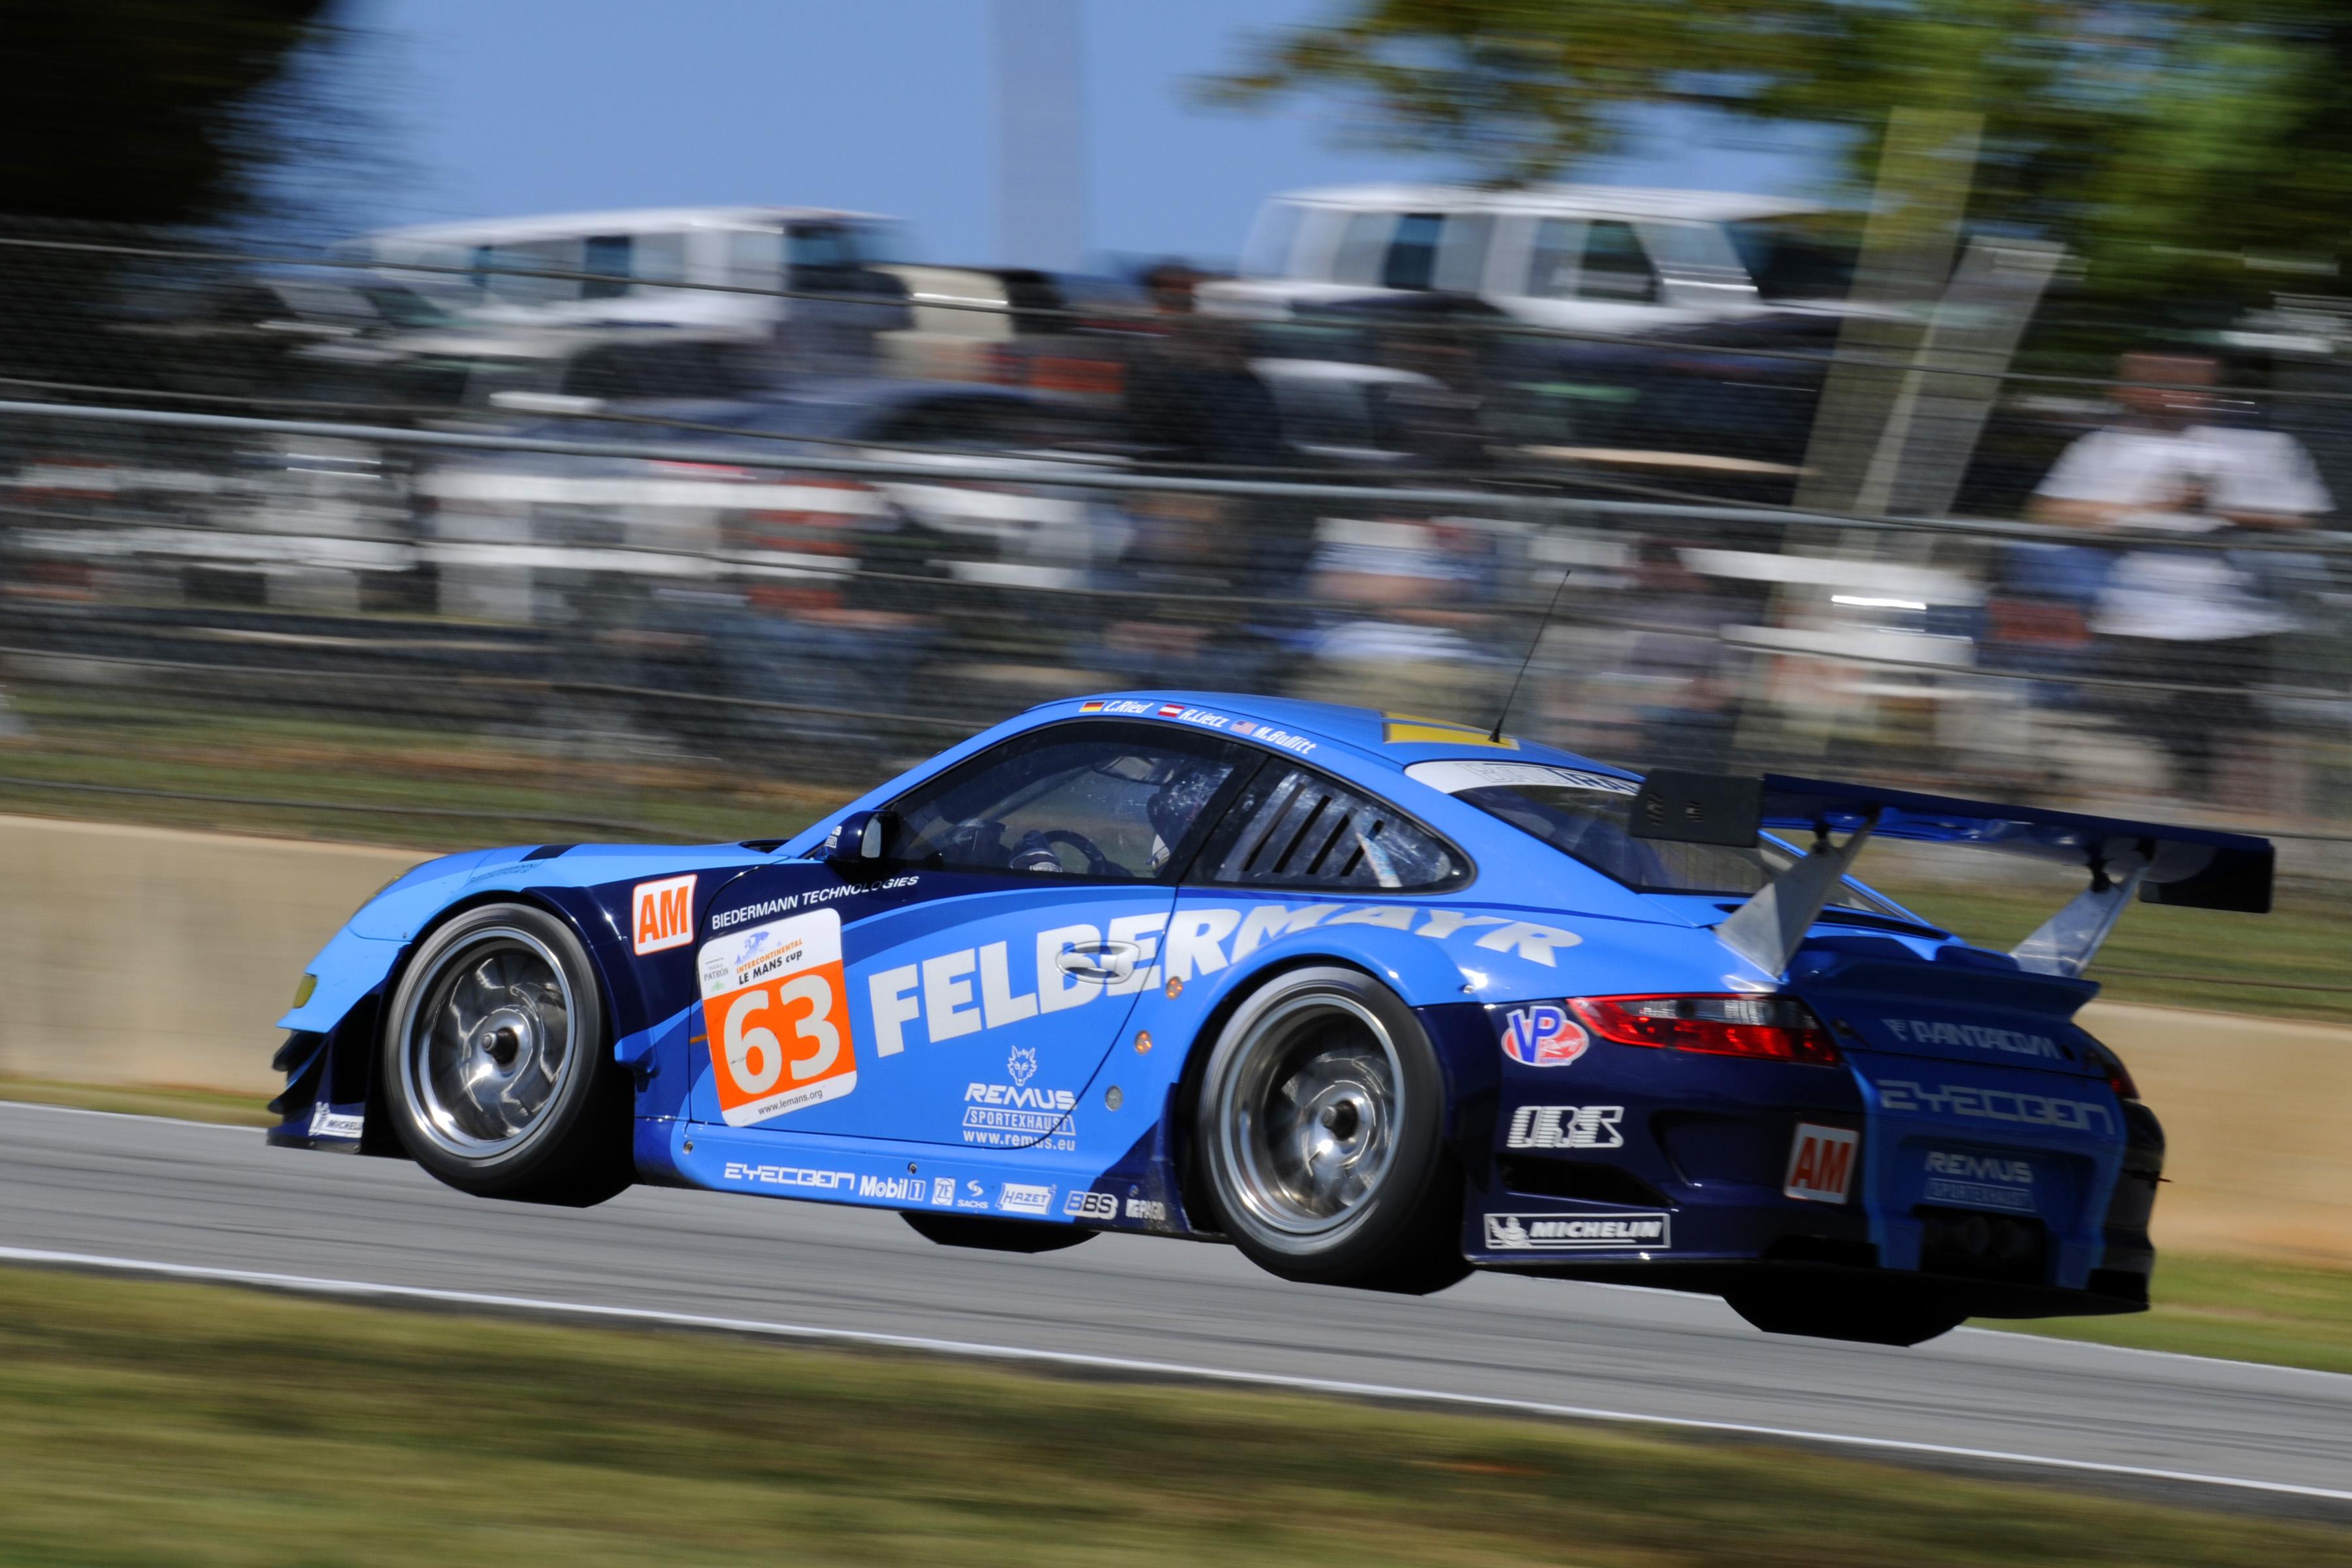 m11_4136_fine Inspiring Porsche 911 Gt1 Road atlanta Cars Trend